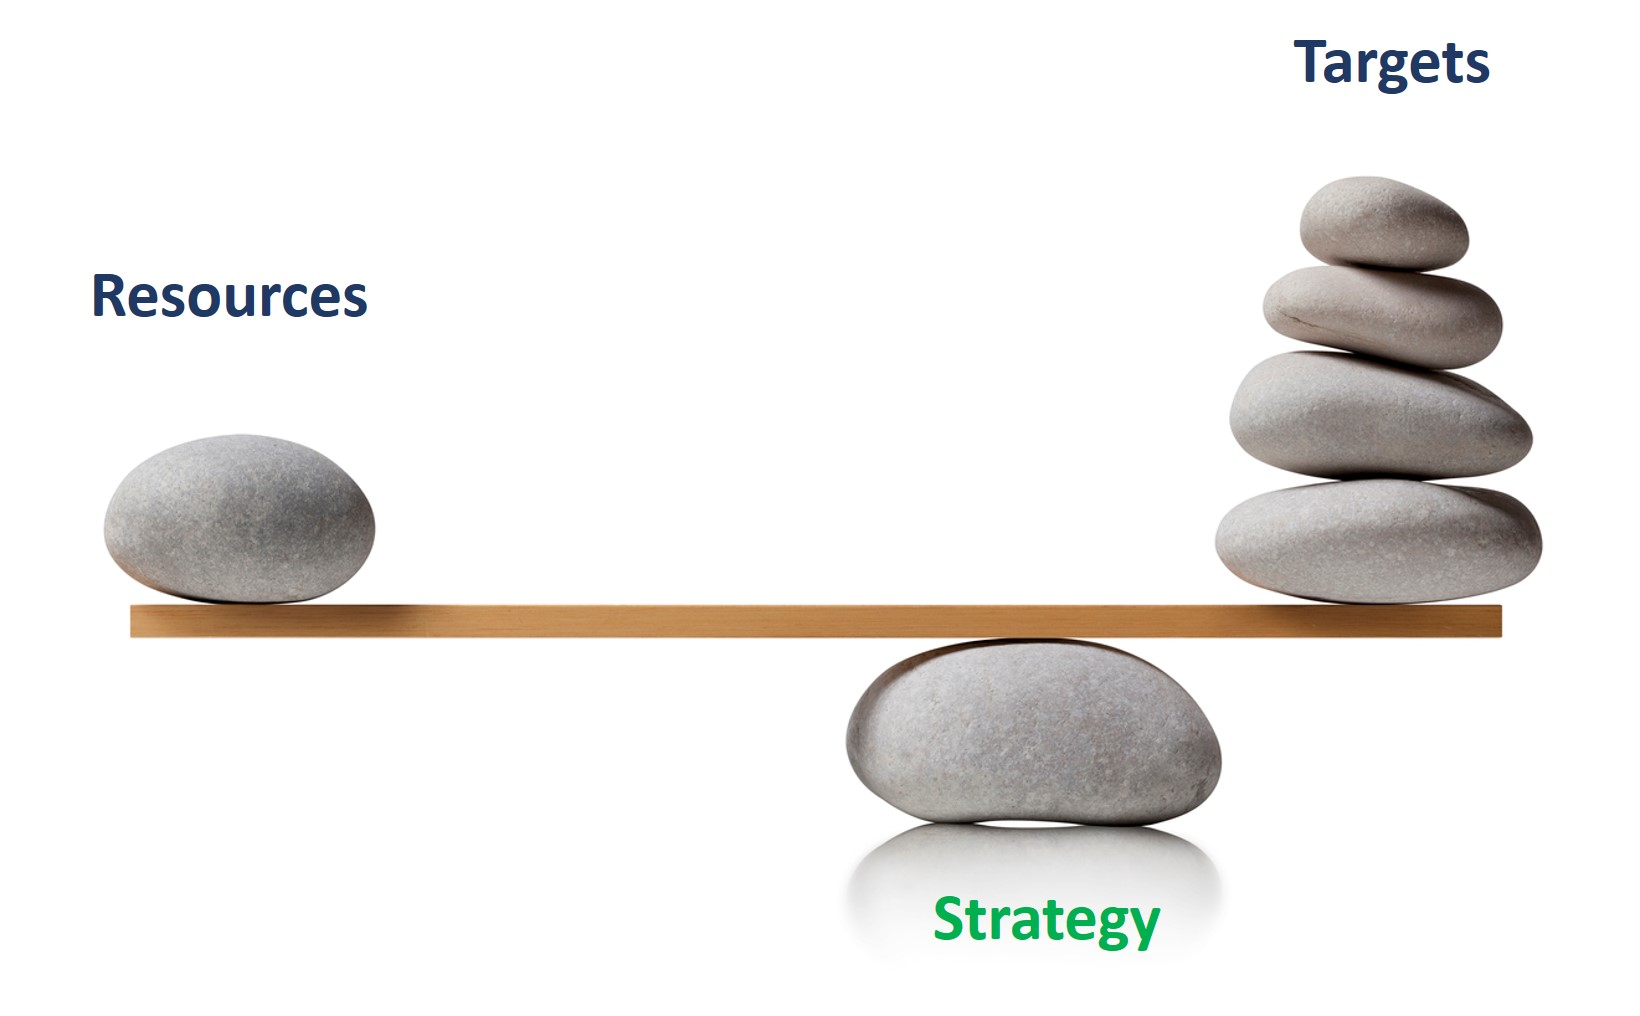 Customer Experience is the Sleeper Strategy for B2B Companies